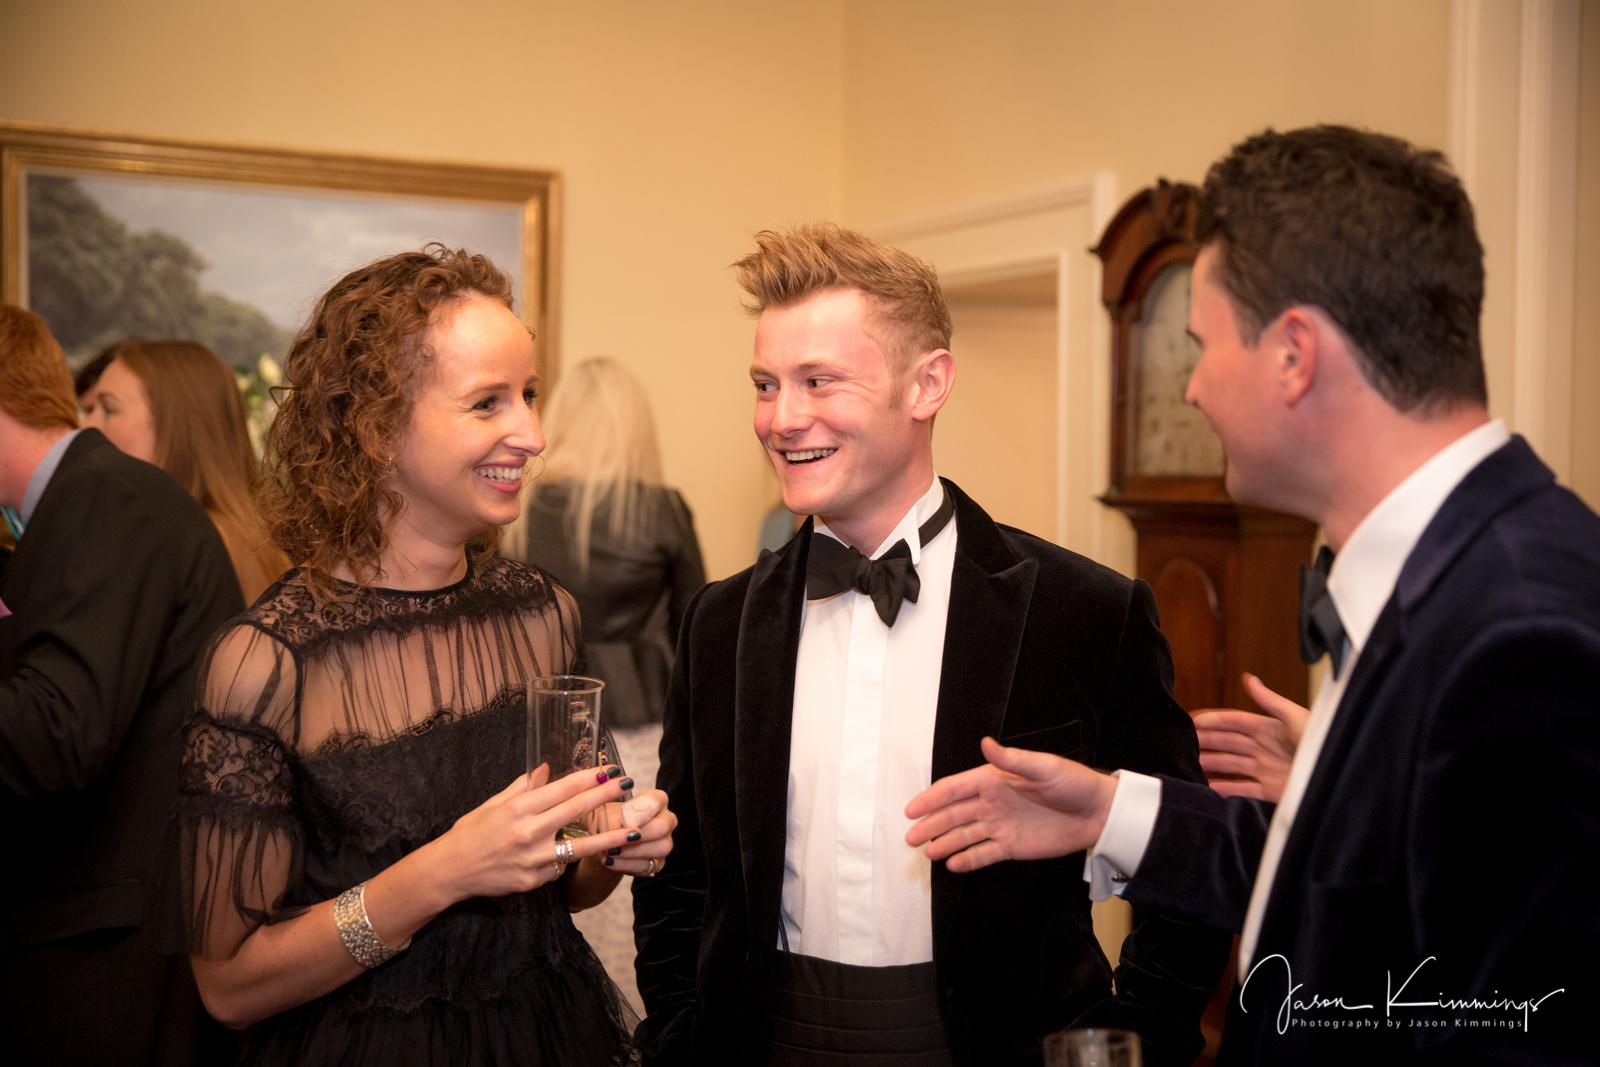 Party-event-photography-west-lothian-edinburgh-glasgow-6.jpg